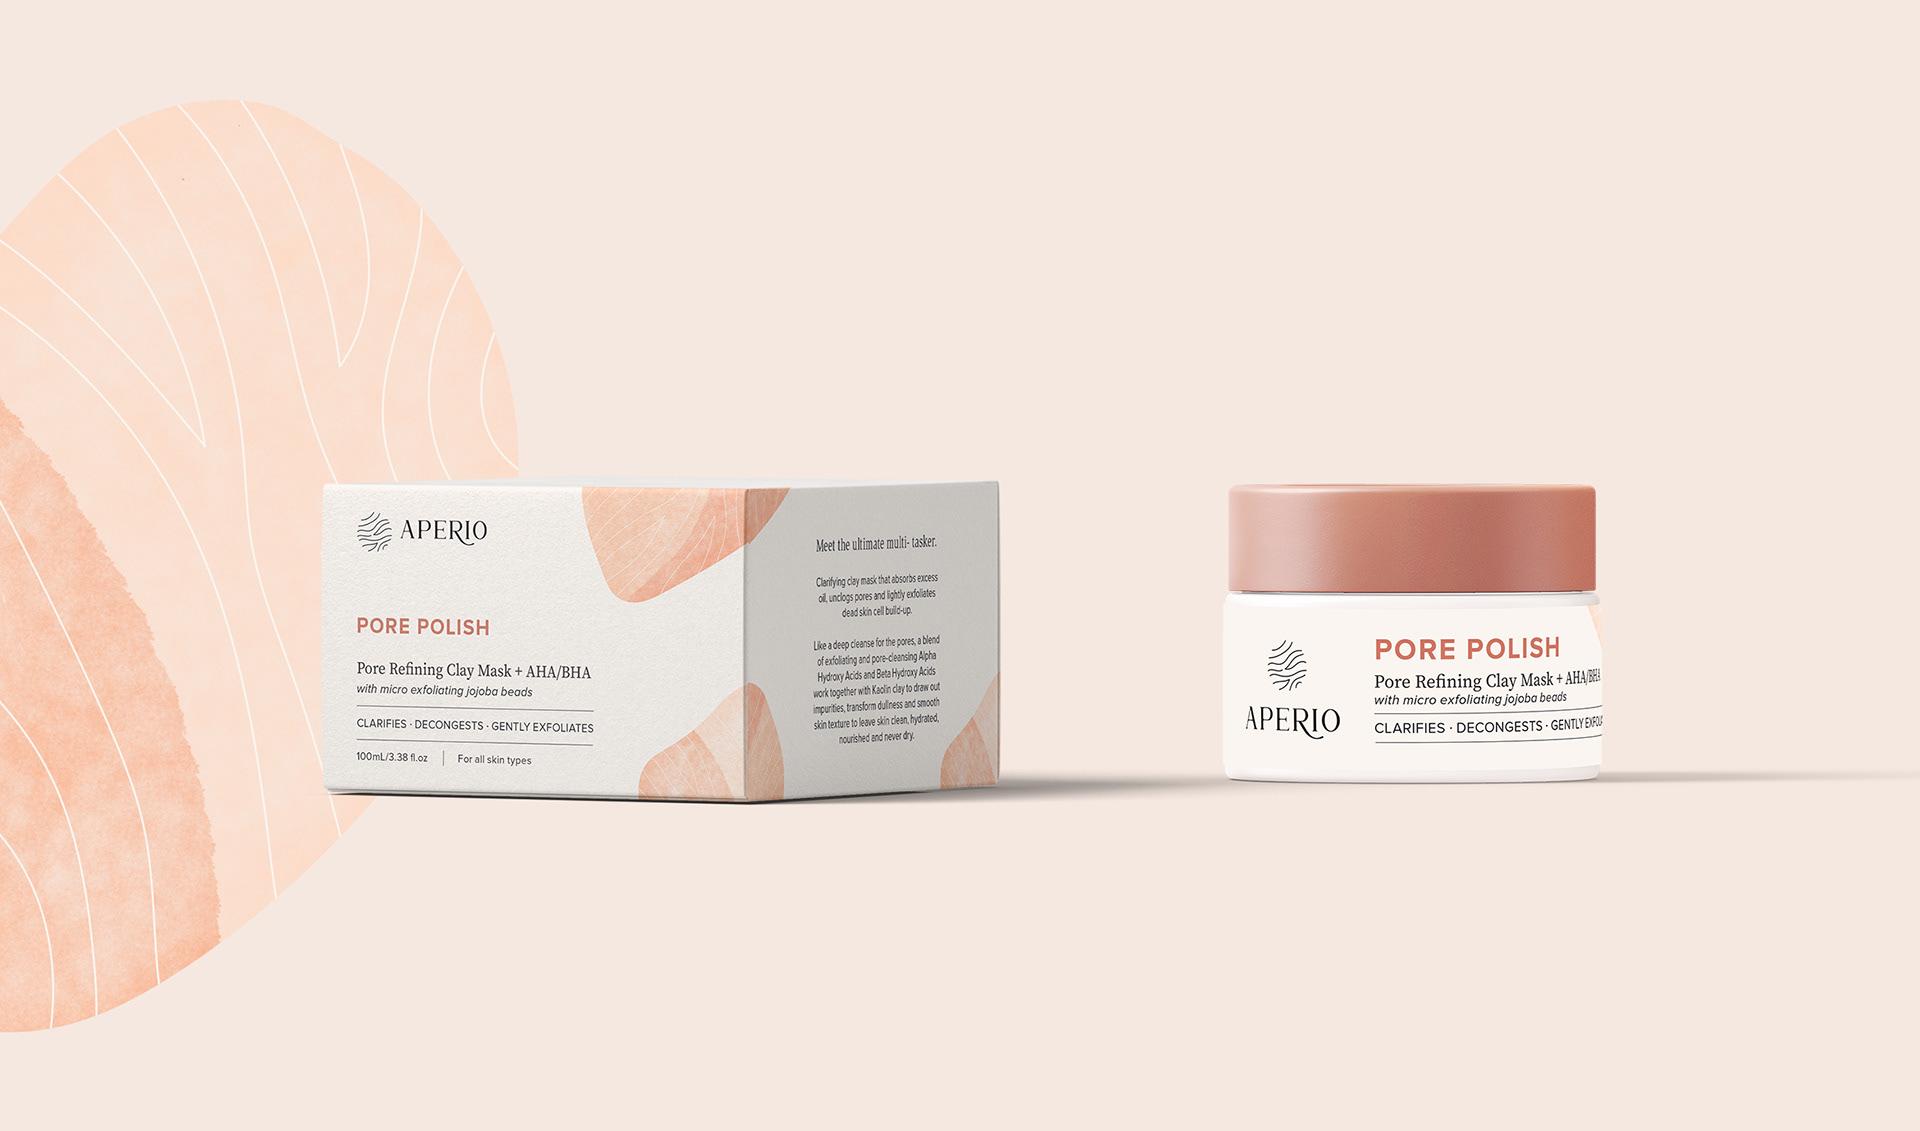 Aperio Skincare护肤品牌与包装设计